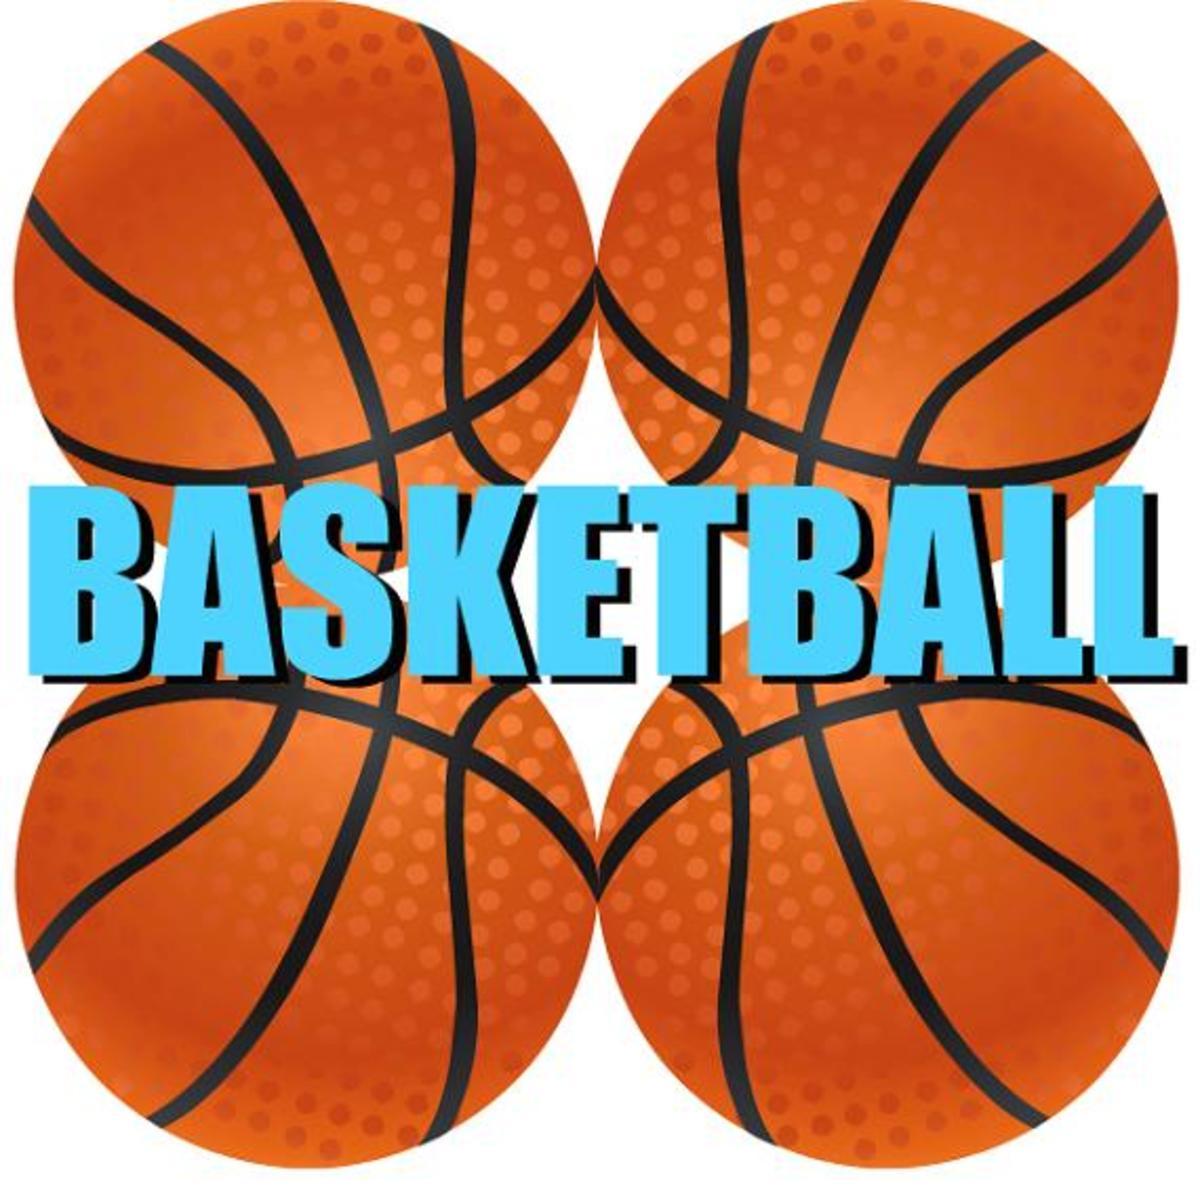 Four basketballs clip art